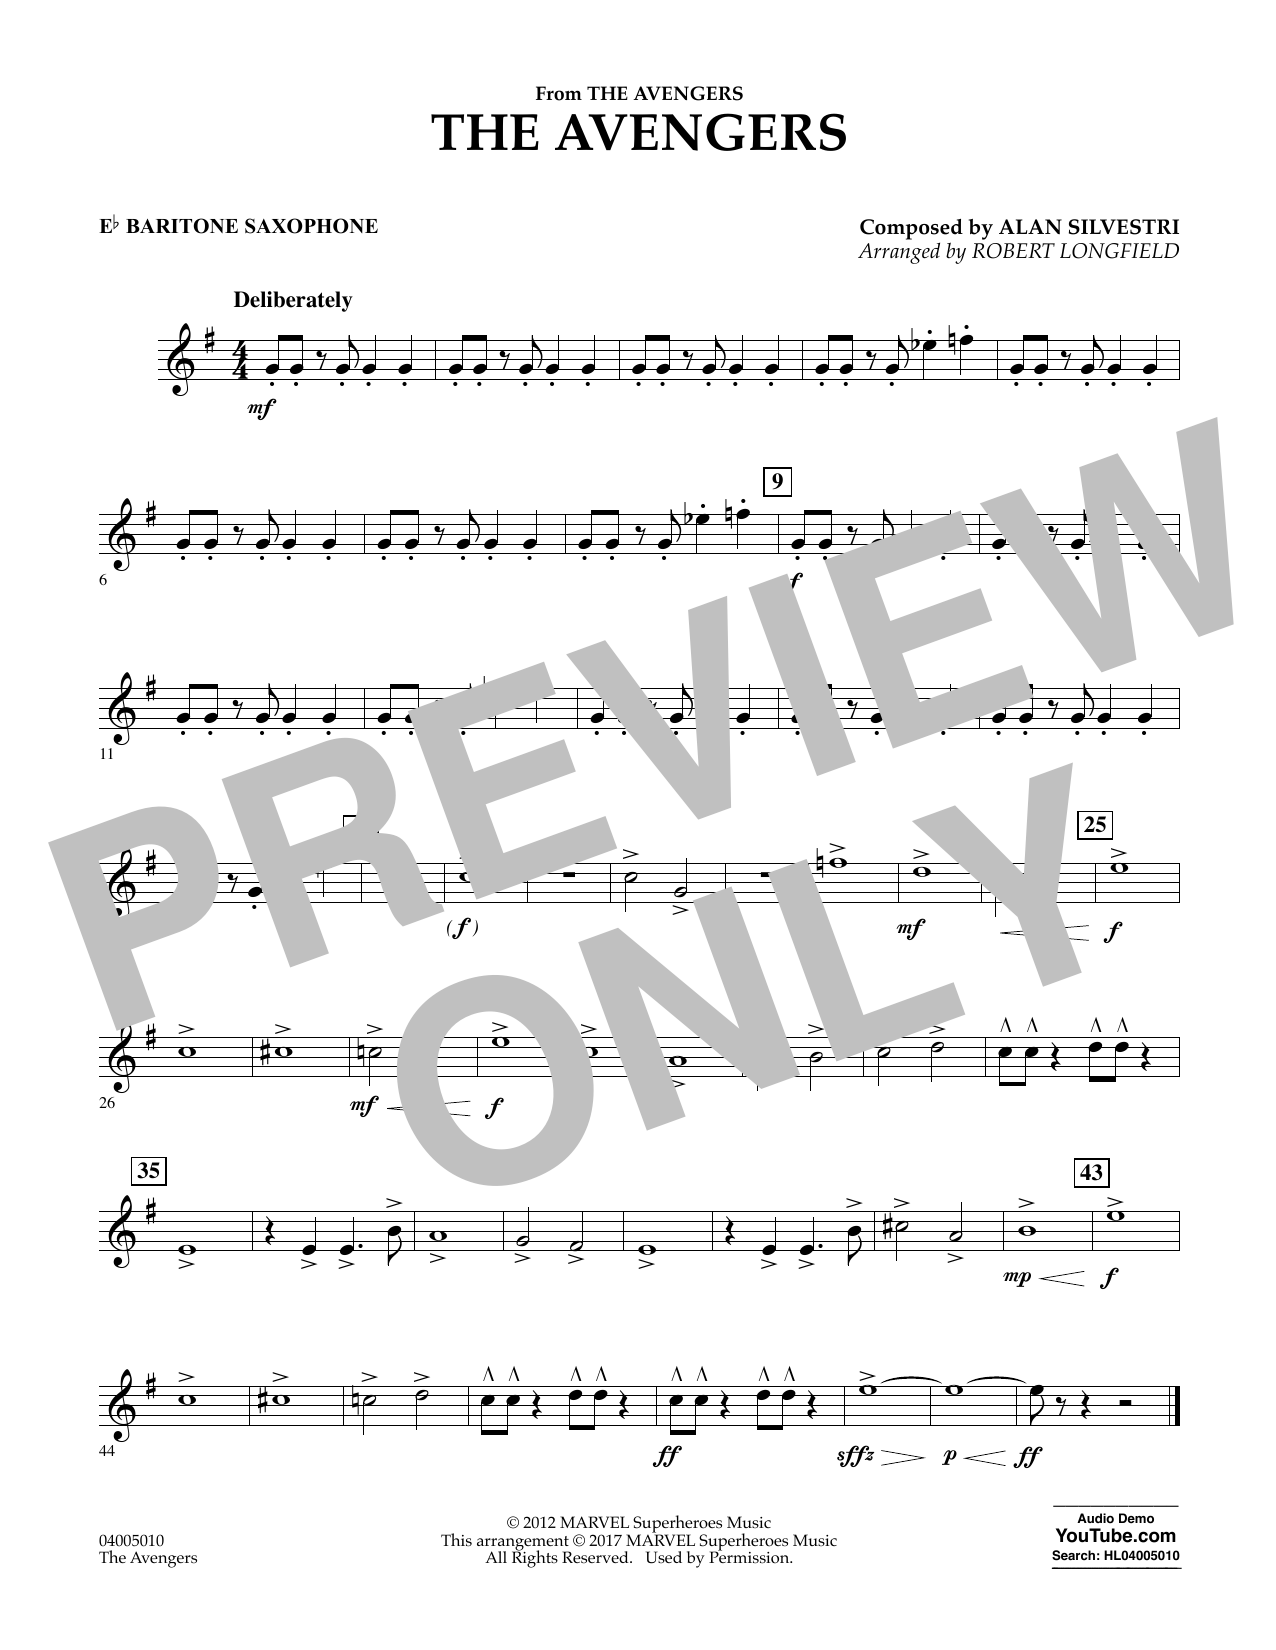 Alan Silvestri - The Avengers - Eb Baritone Saxophone